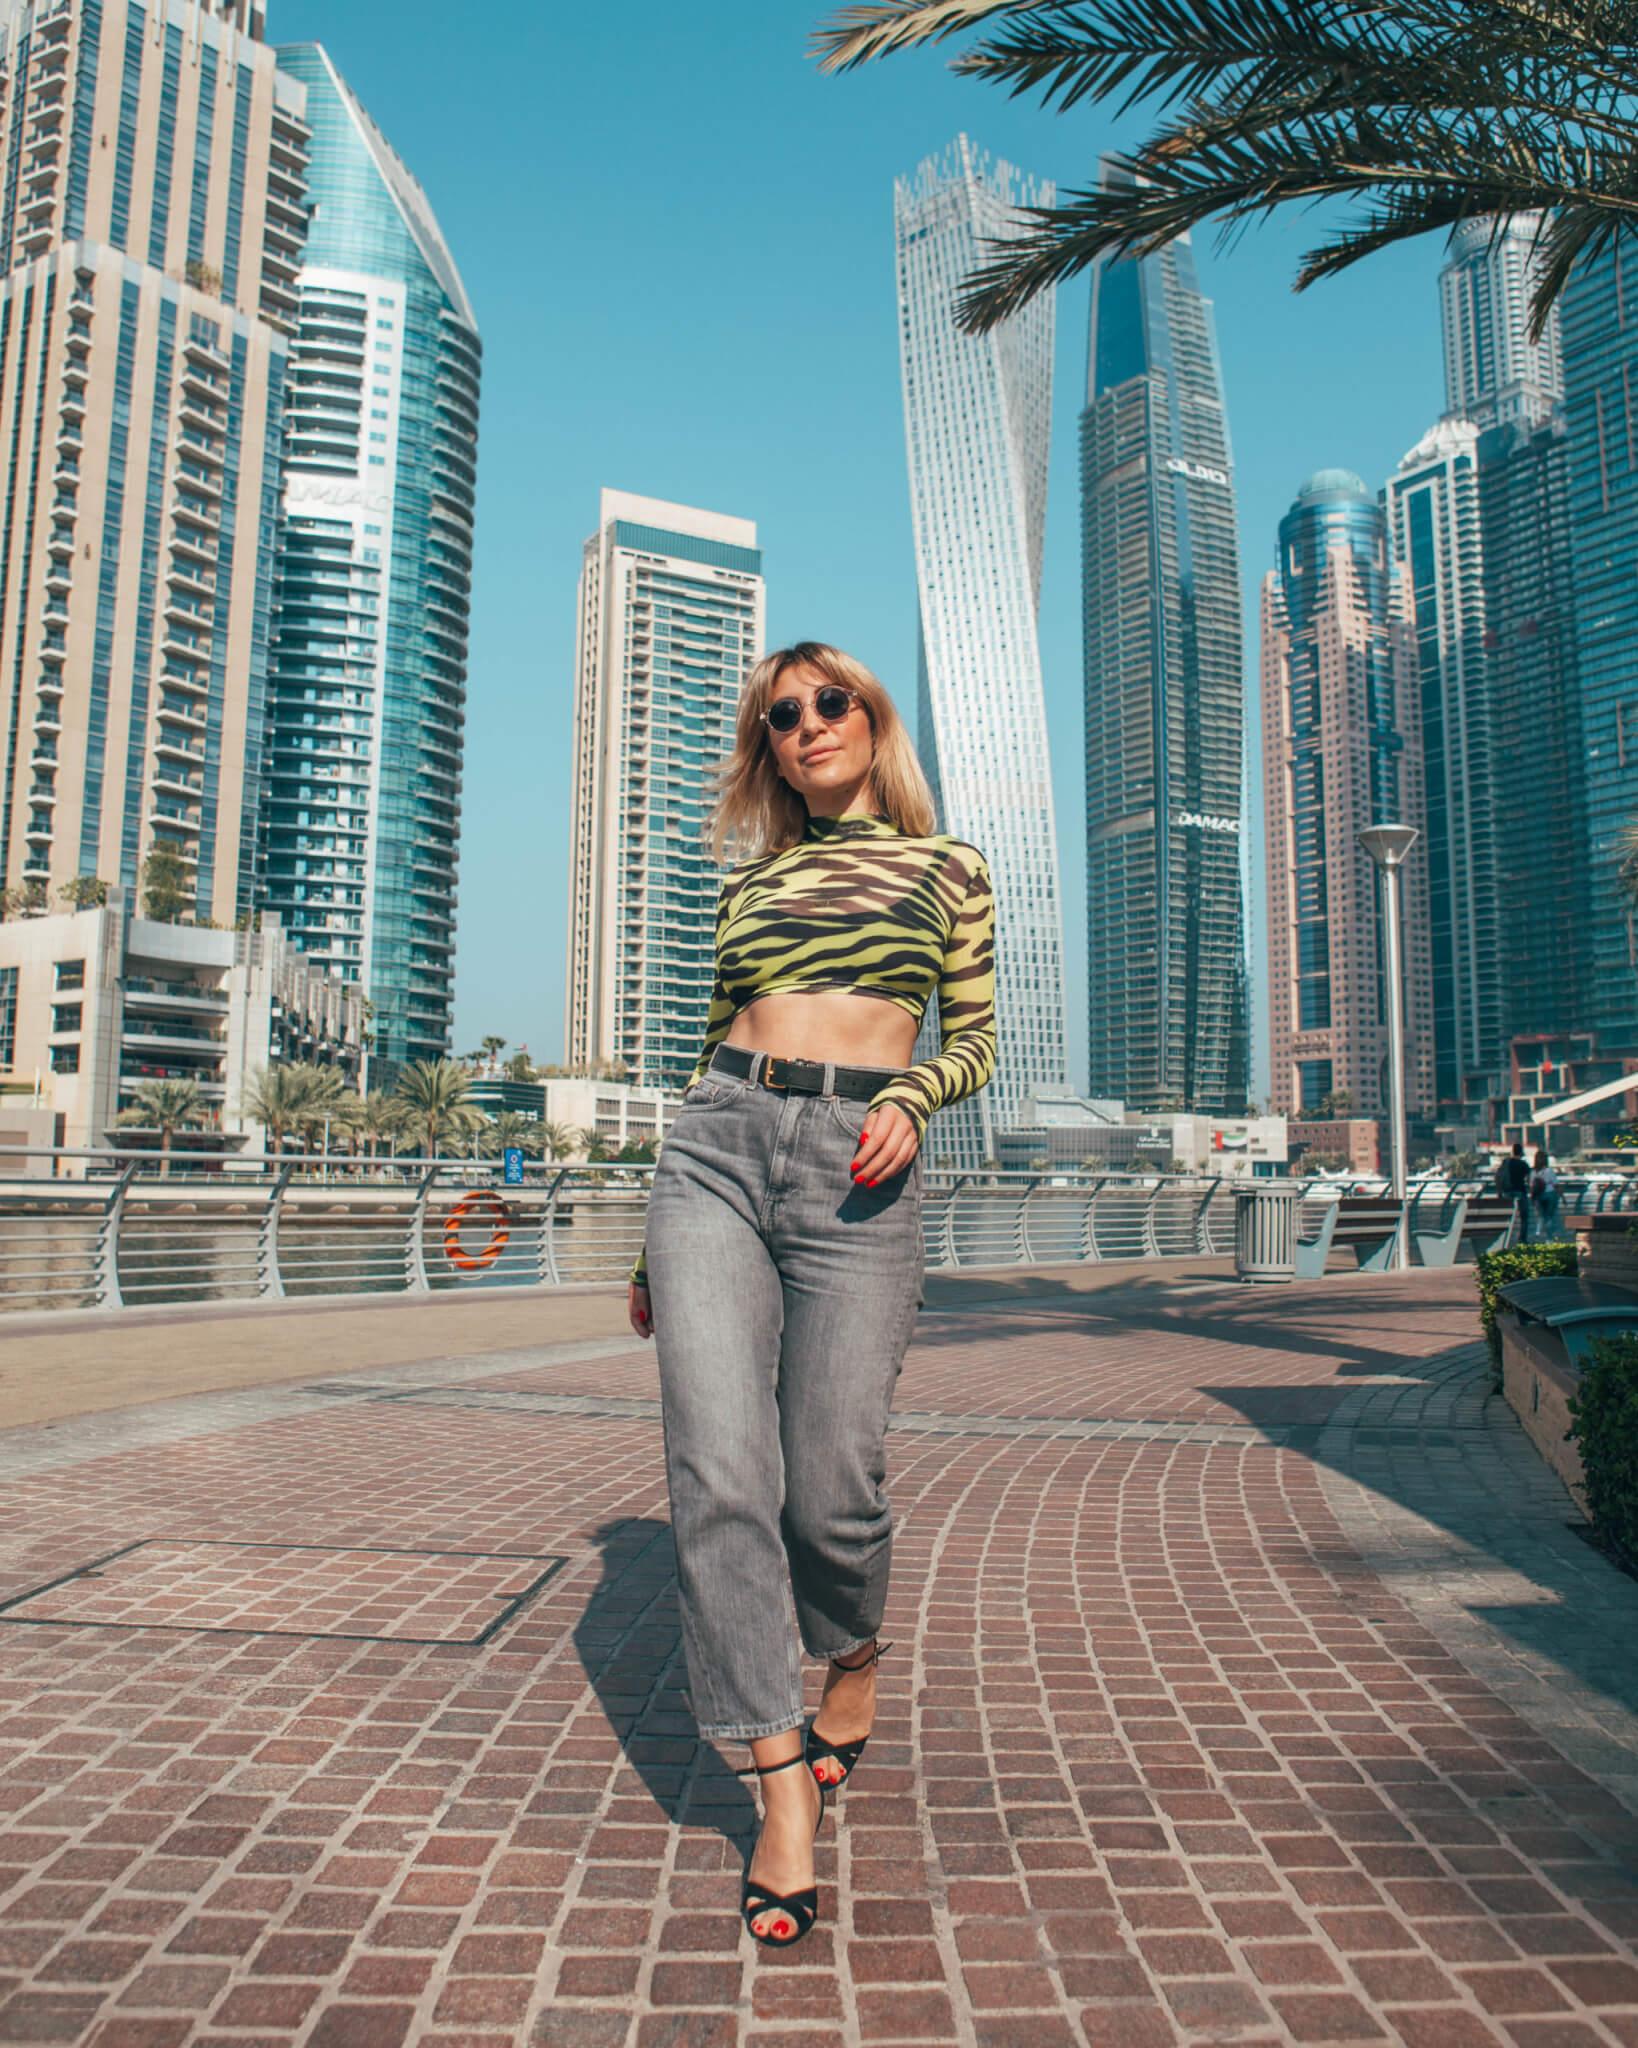 5 best things to do in Dubai 2020 - Dubai Yacht Tour